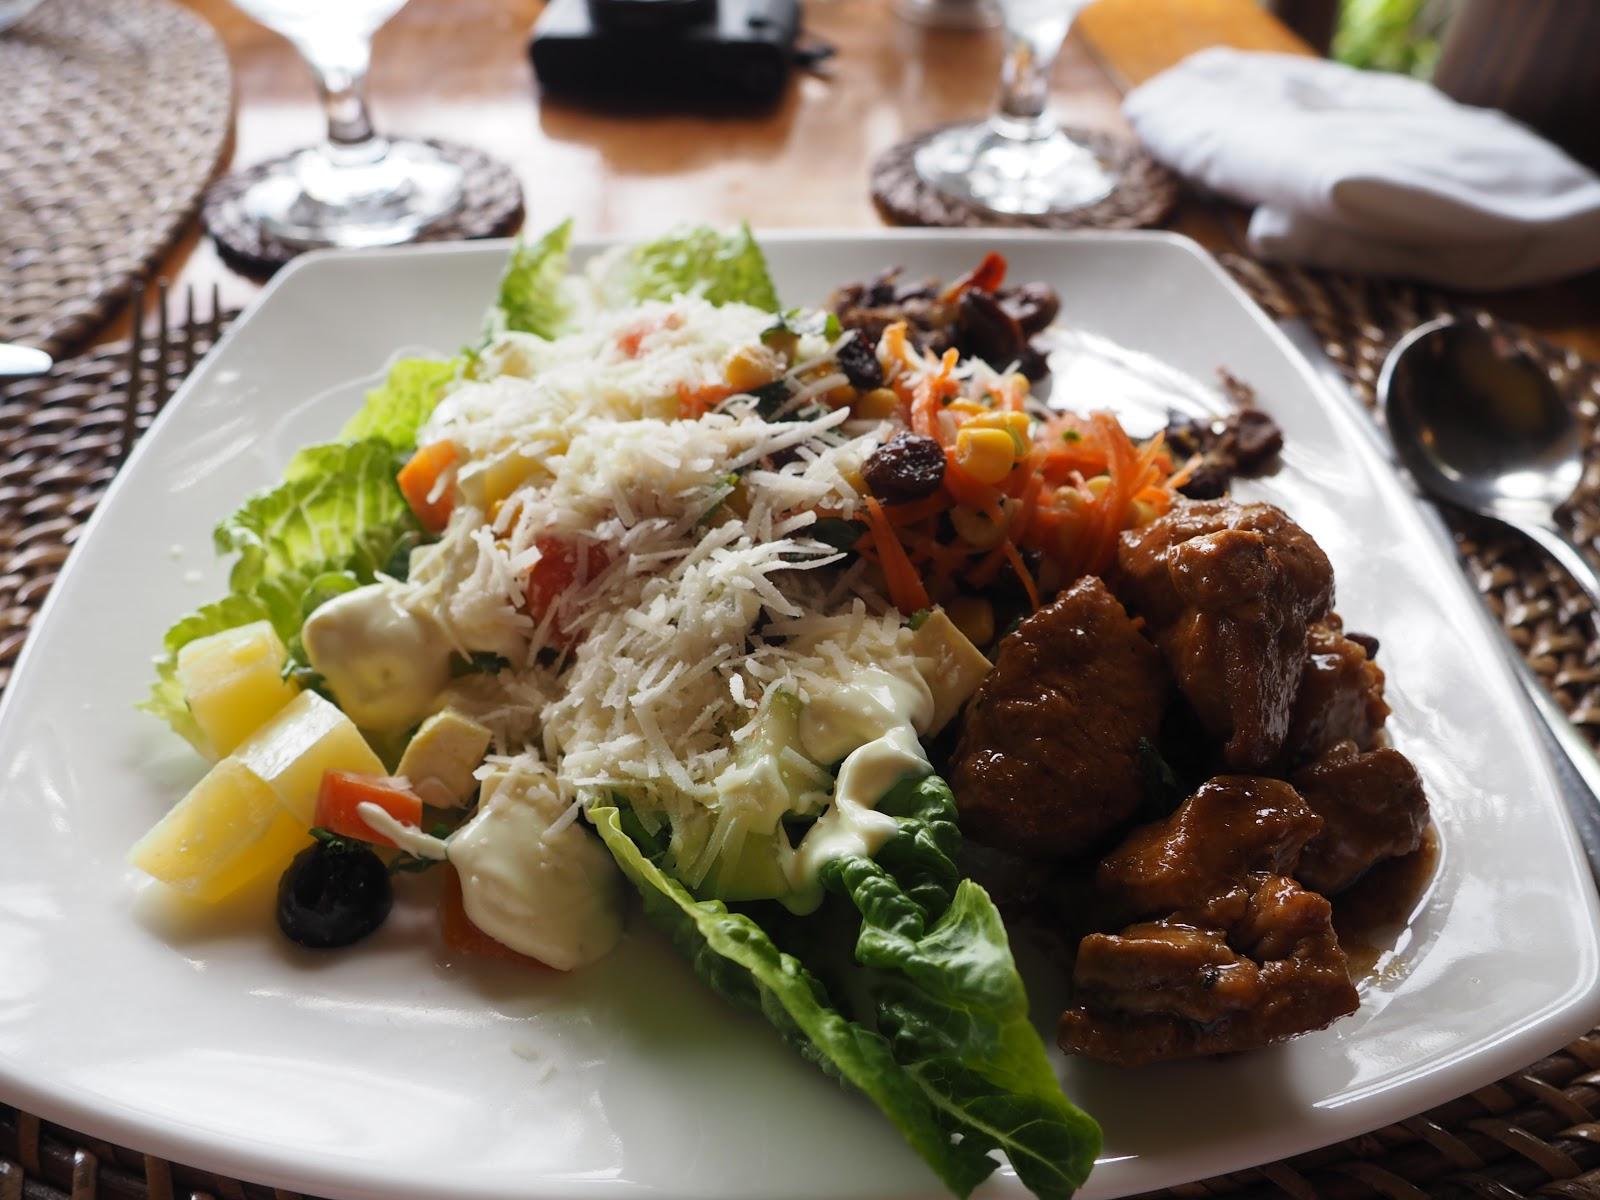 plate of buffet food, Miniloc Island, El Nido